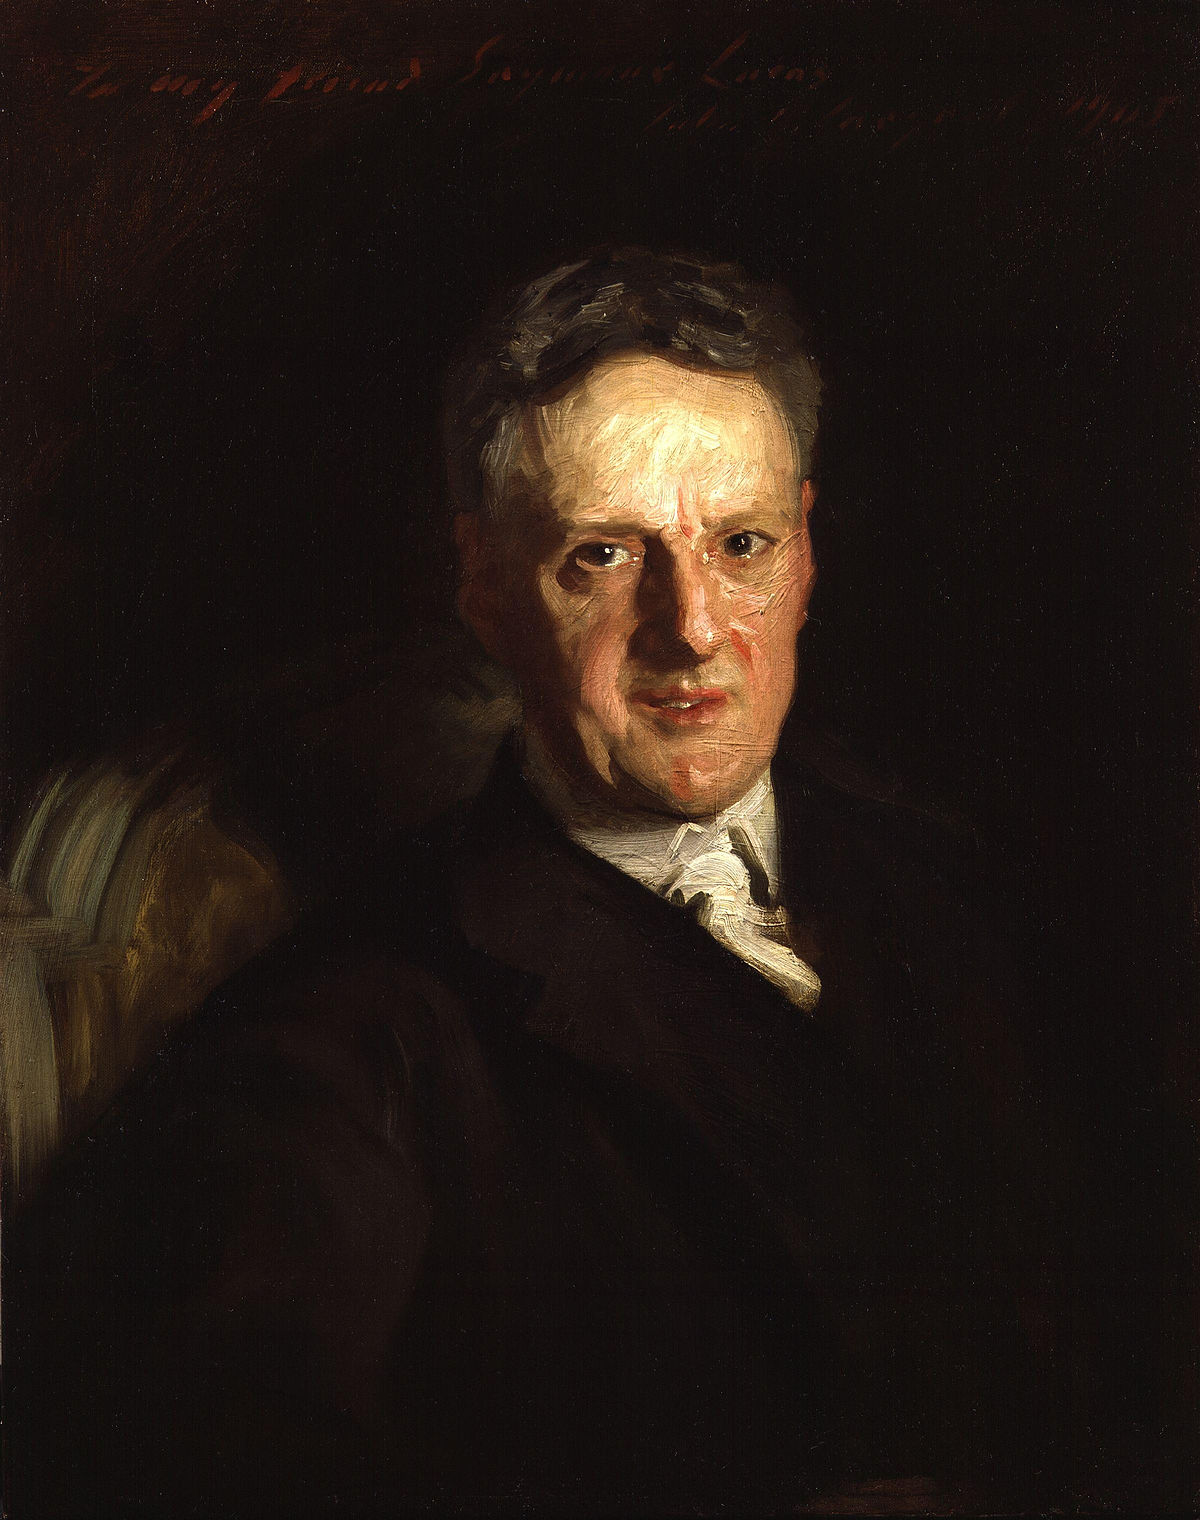 John Seymour Lucas